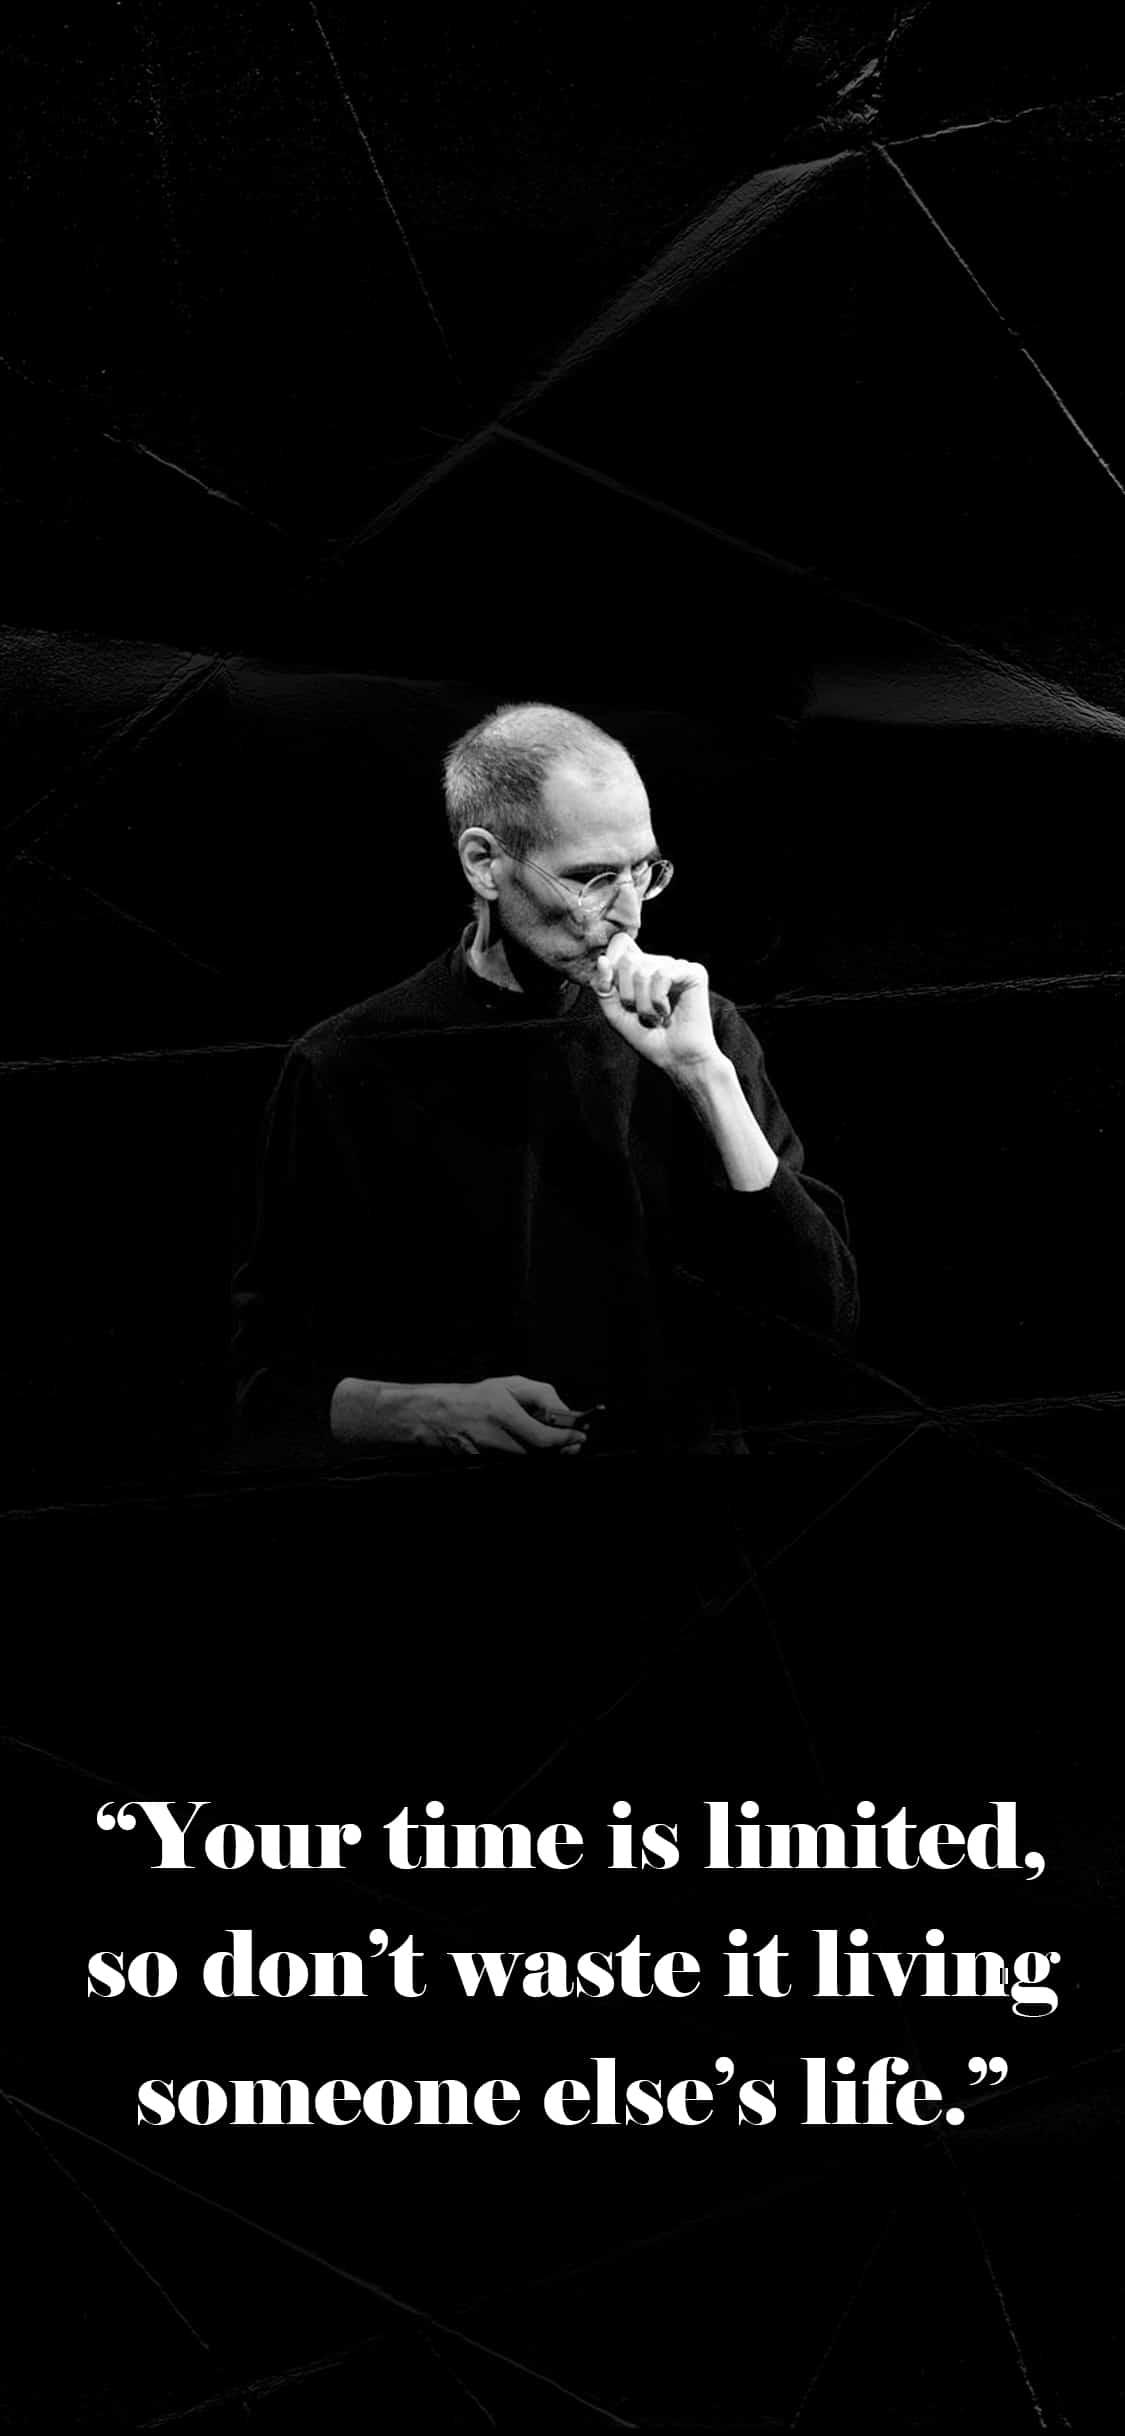 Steve Jobs Inspiring quote 1